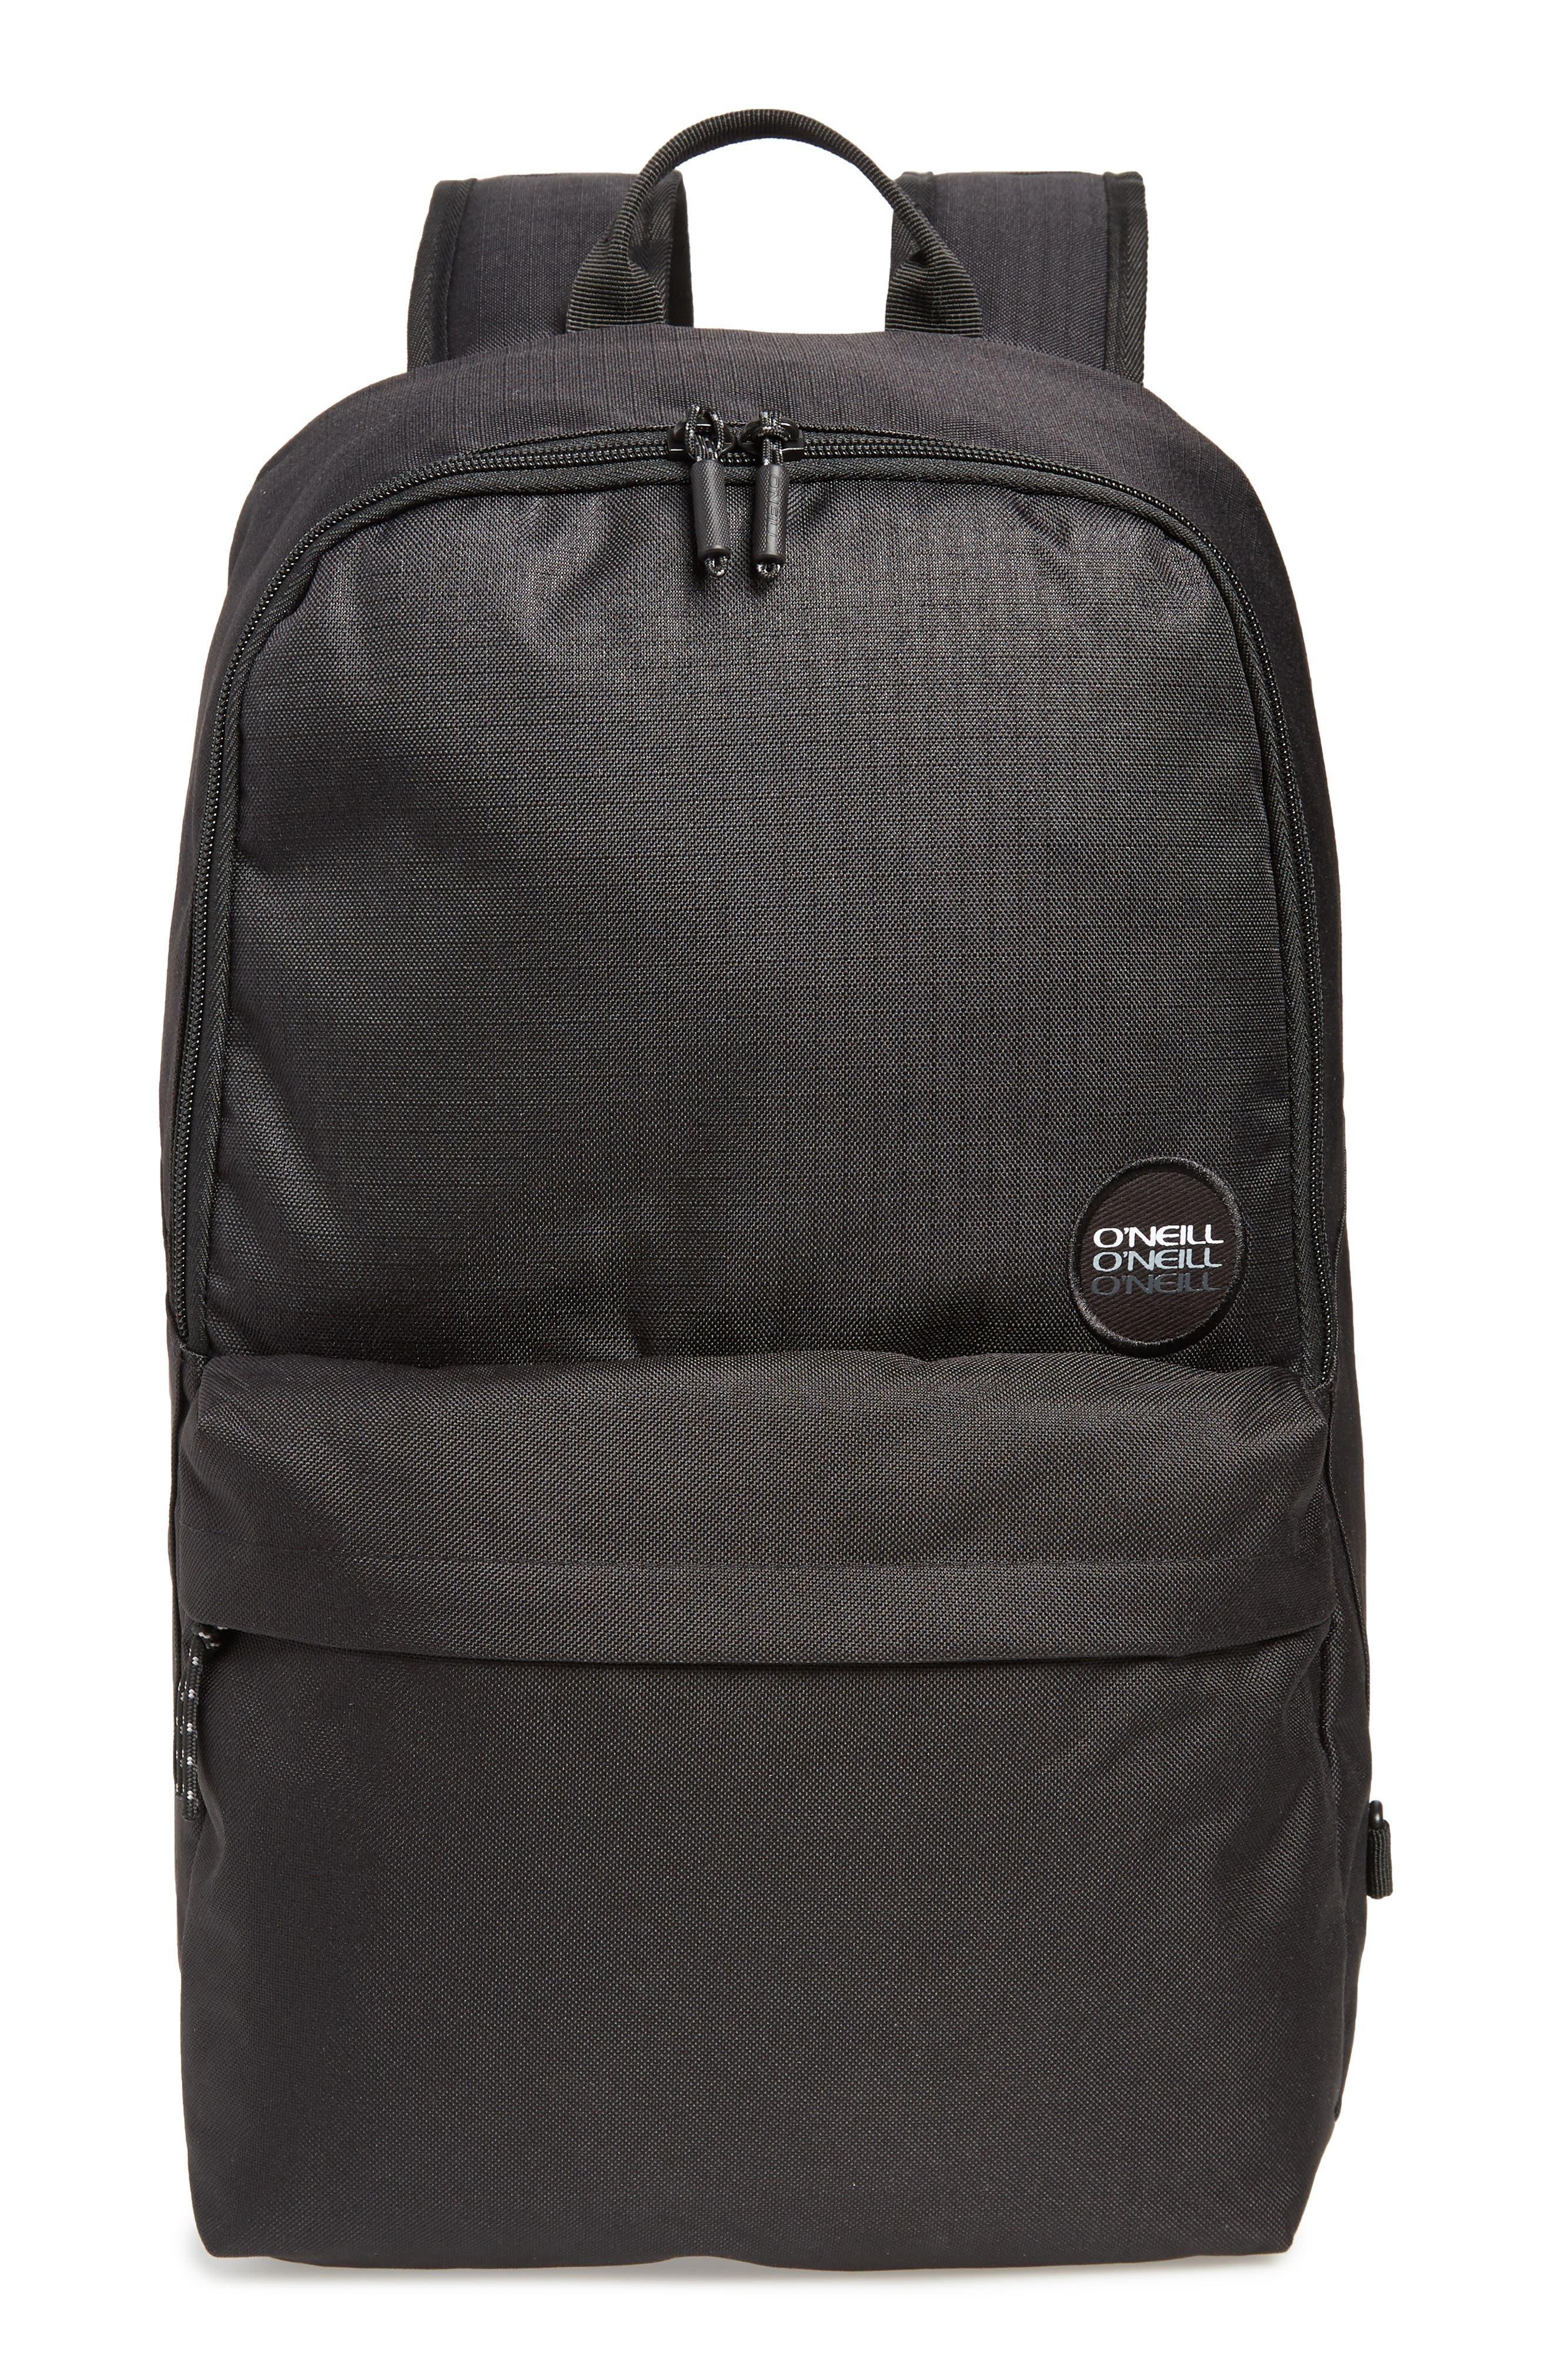 Transfer Backpack,                             Main thumbnail 1, color,                             BLACK